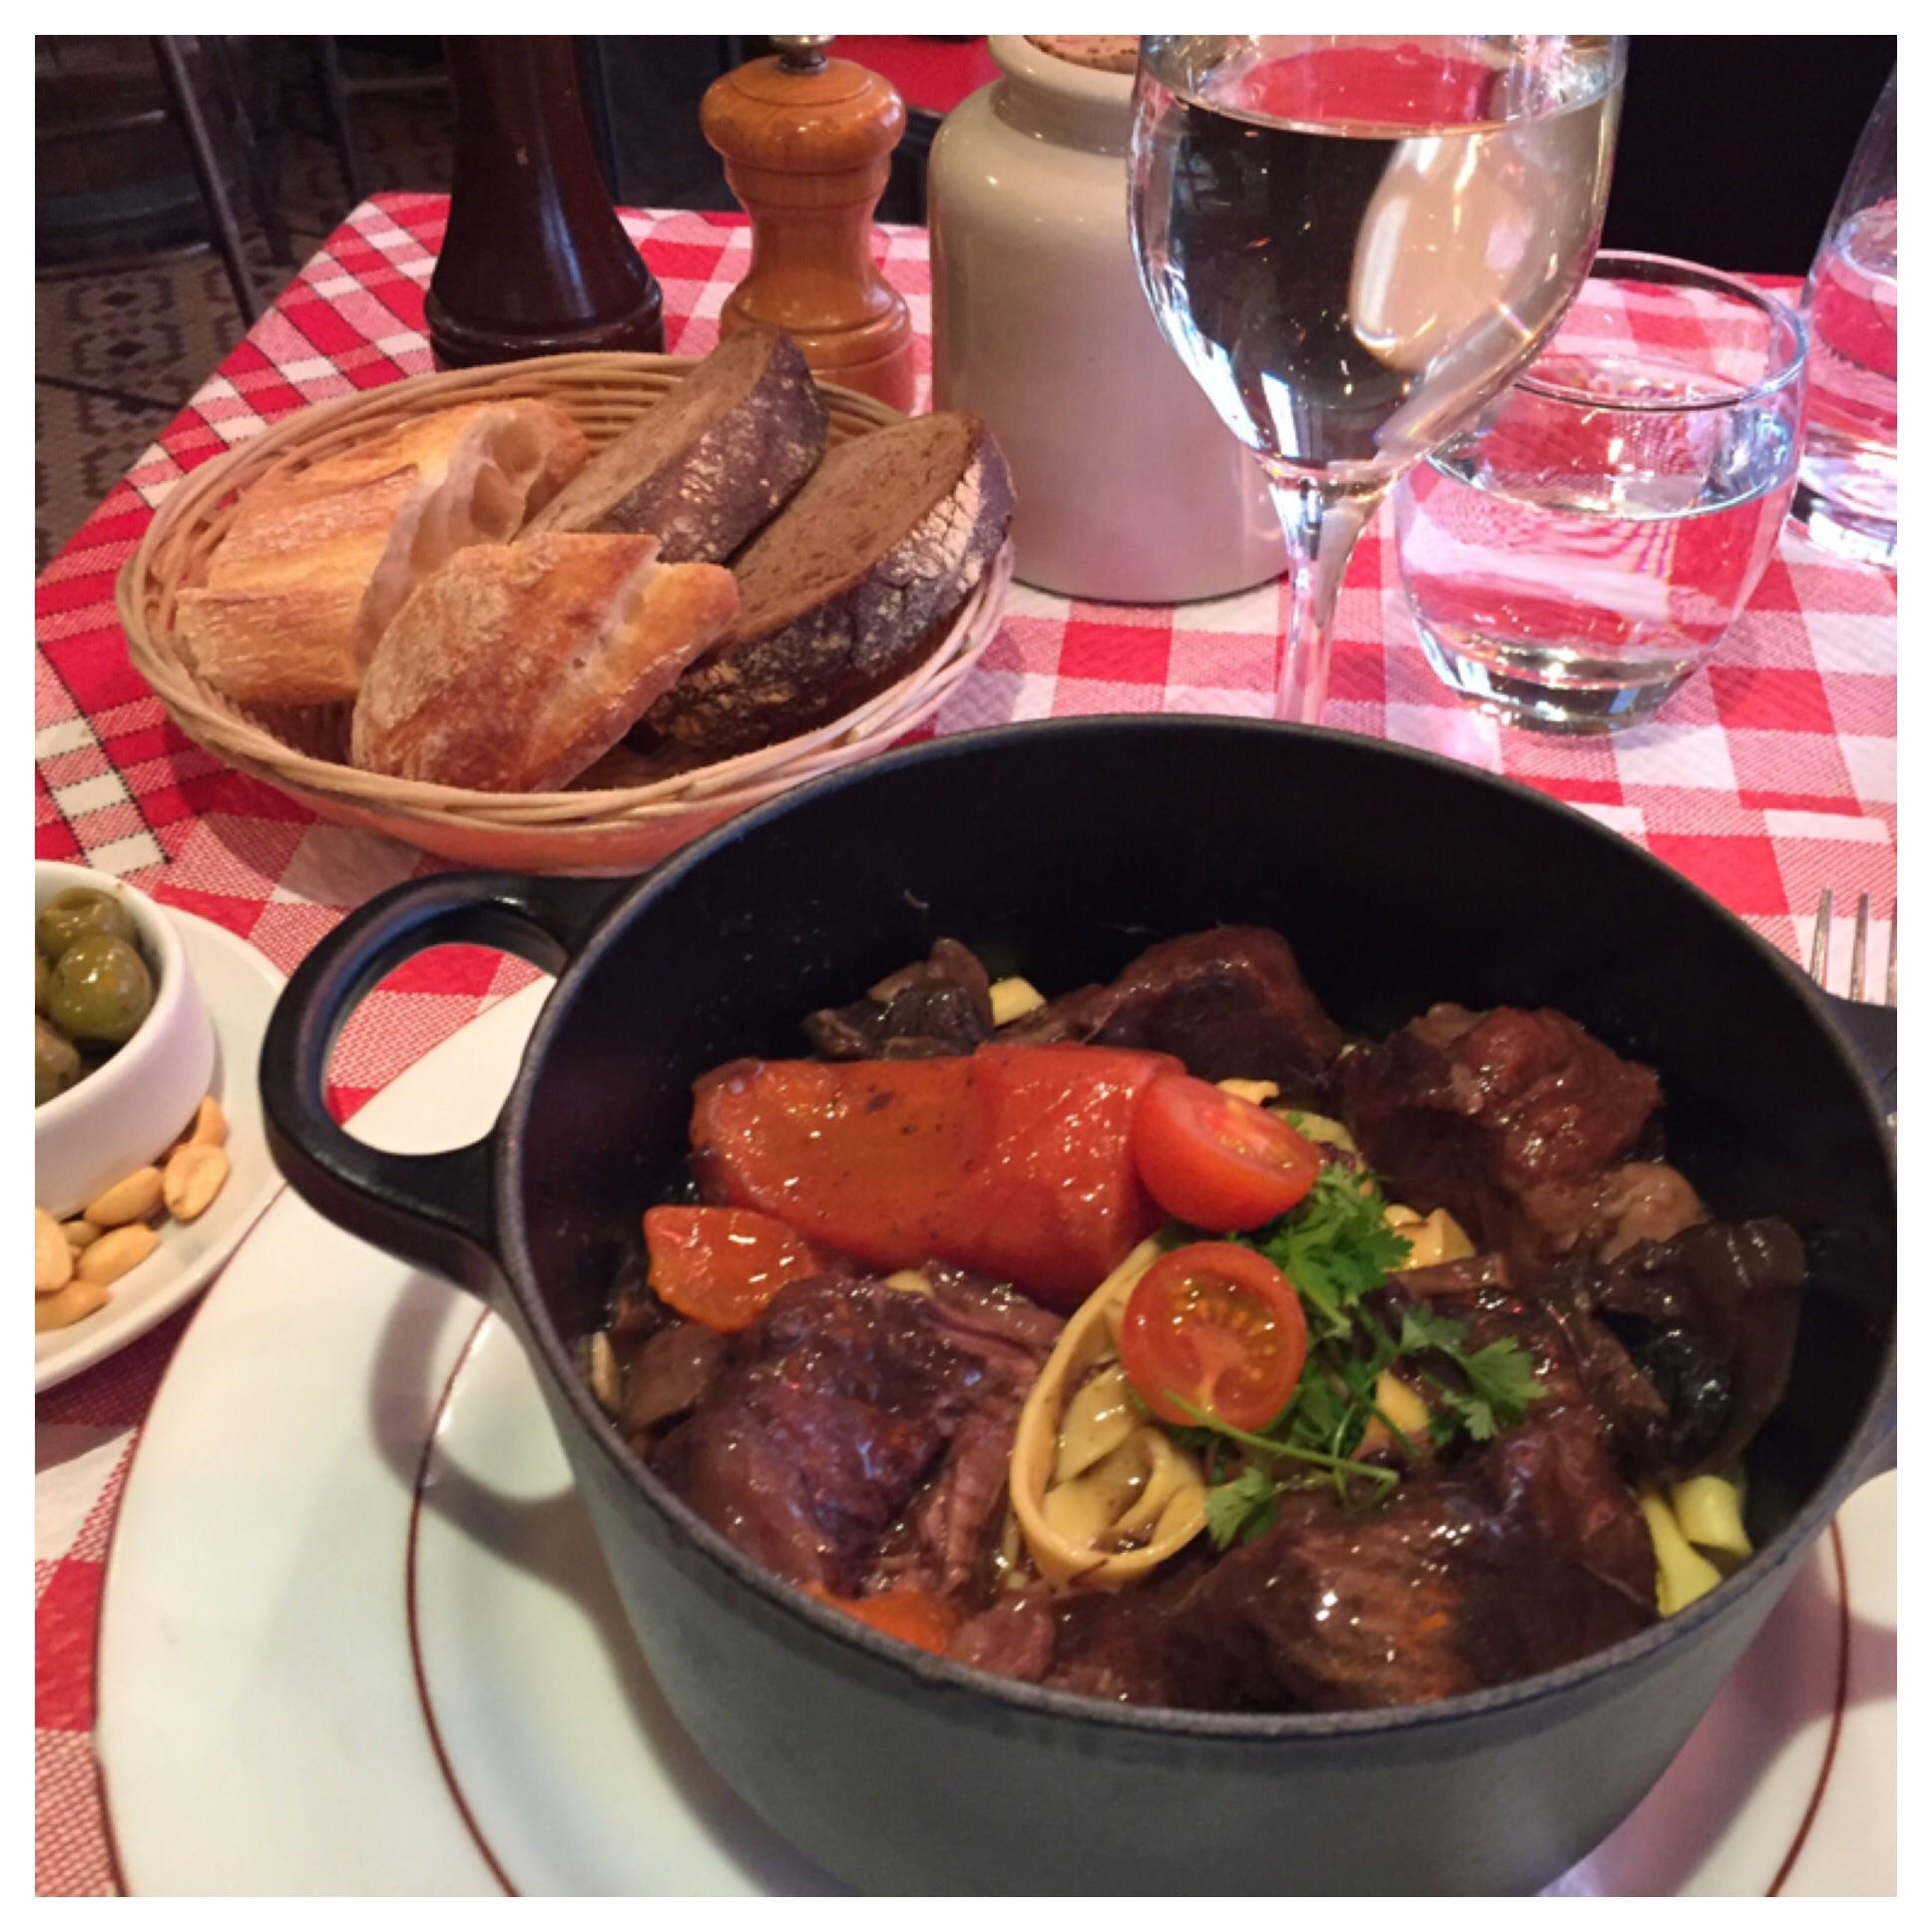 Boeuf Bourguignon - Beef Stew!!! Delicious! Bistro les 4 Saisons in my neighborhood.